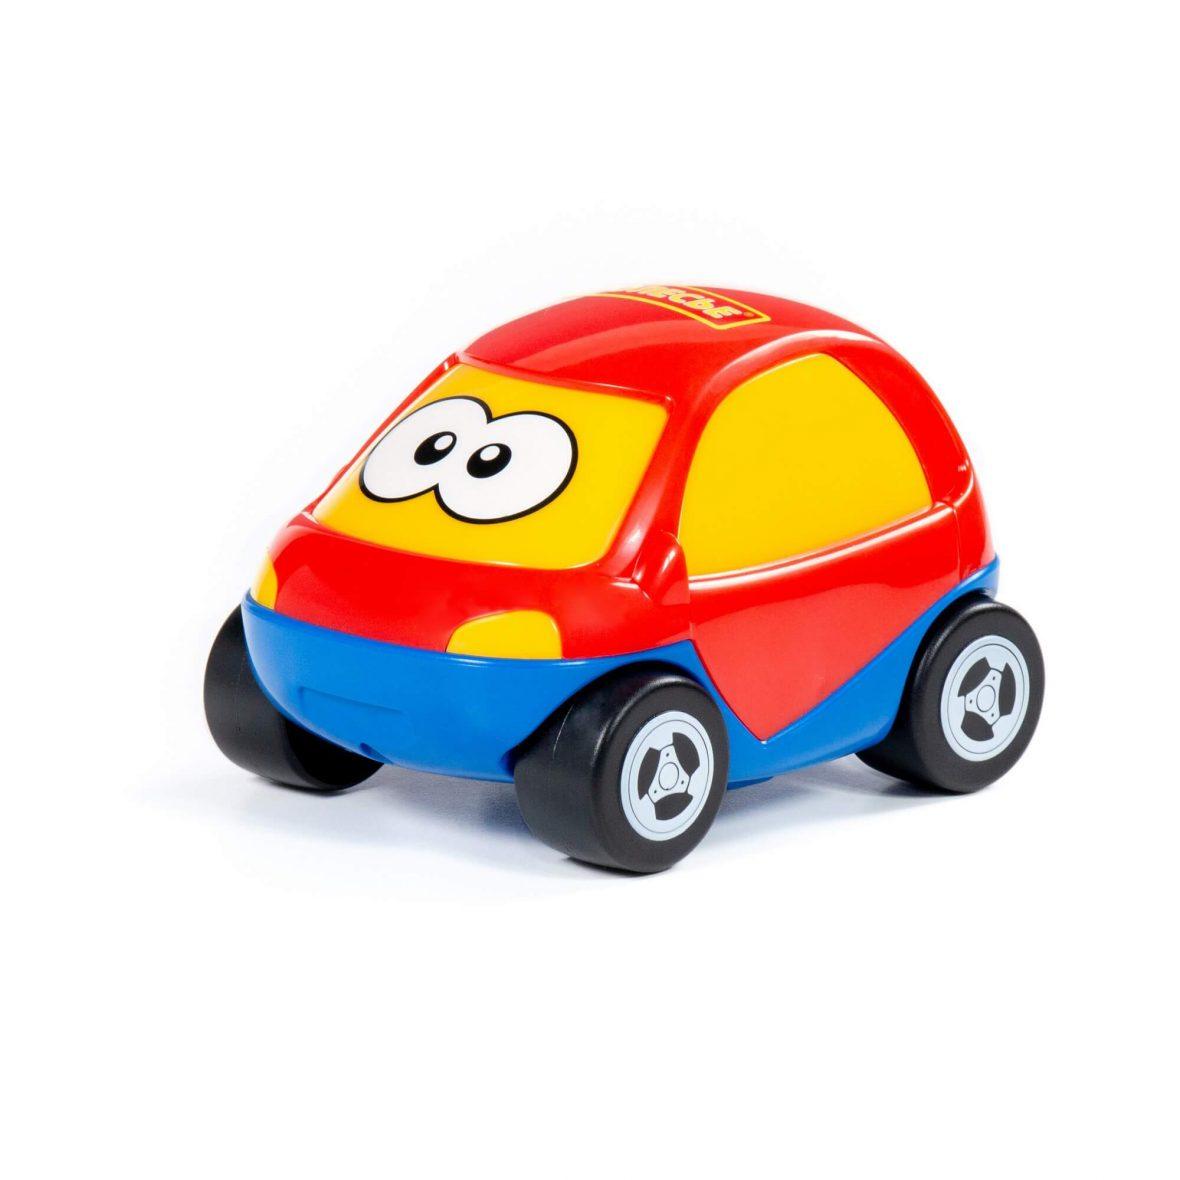 Beetle automobile